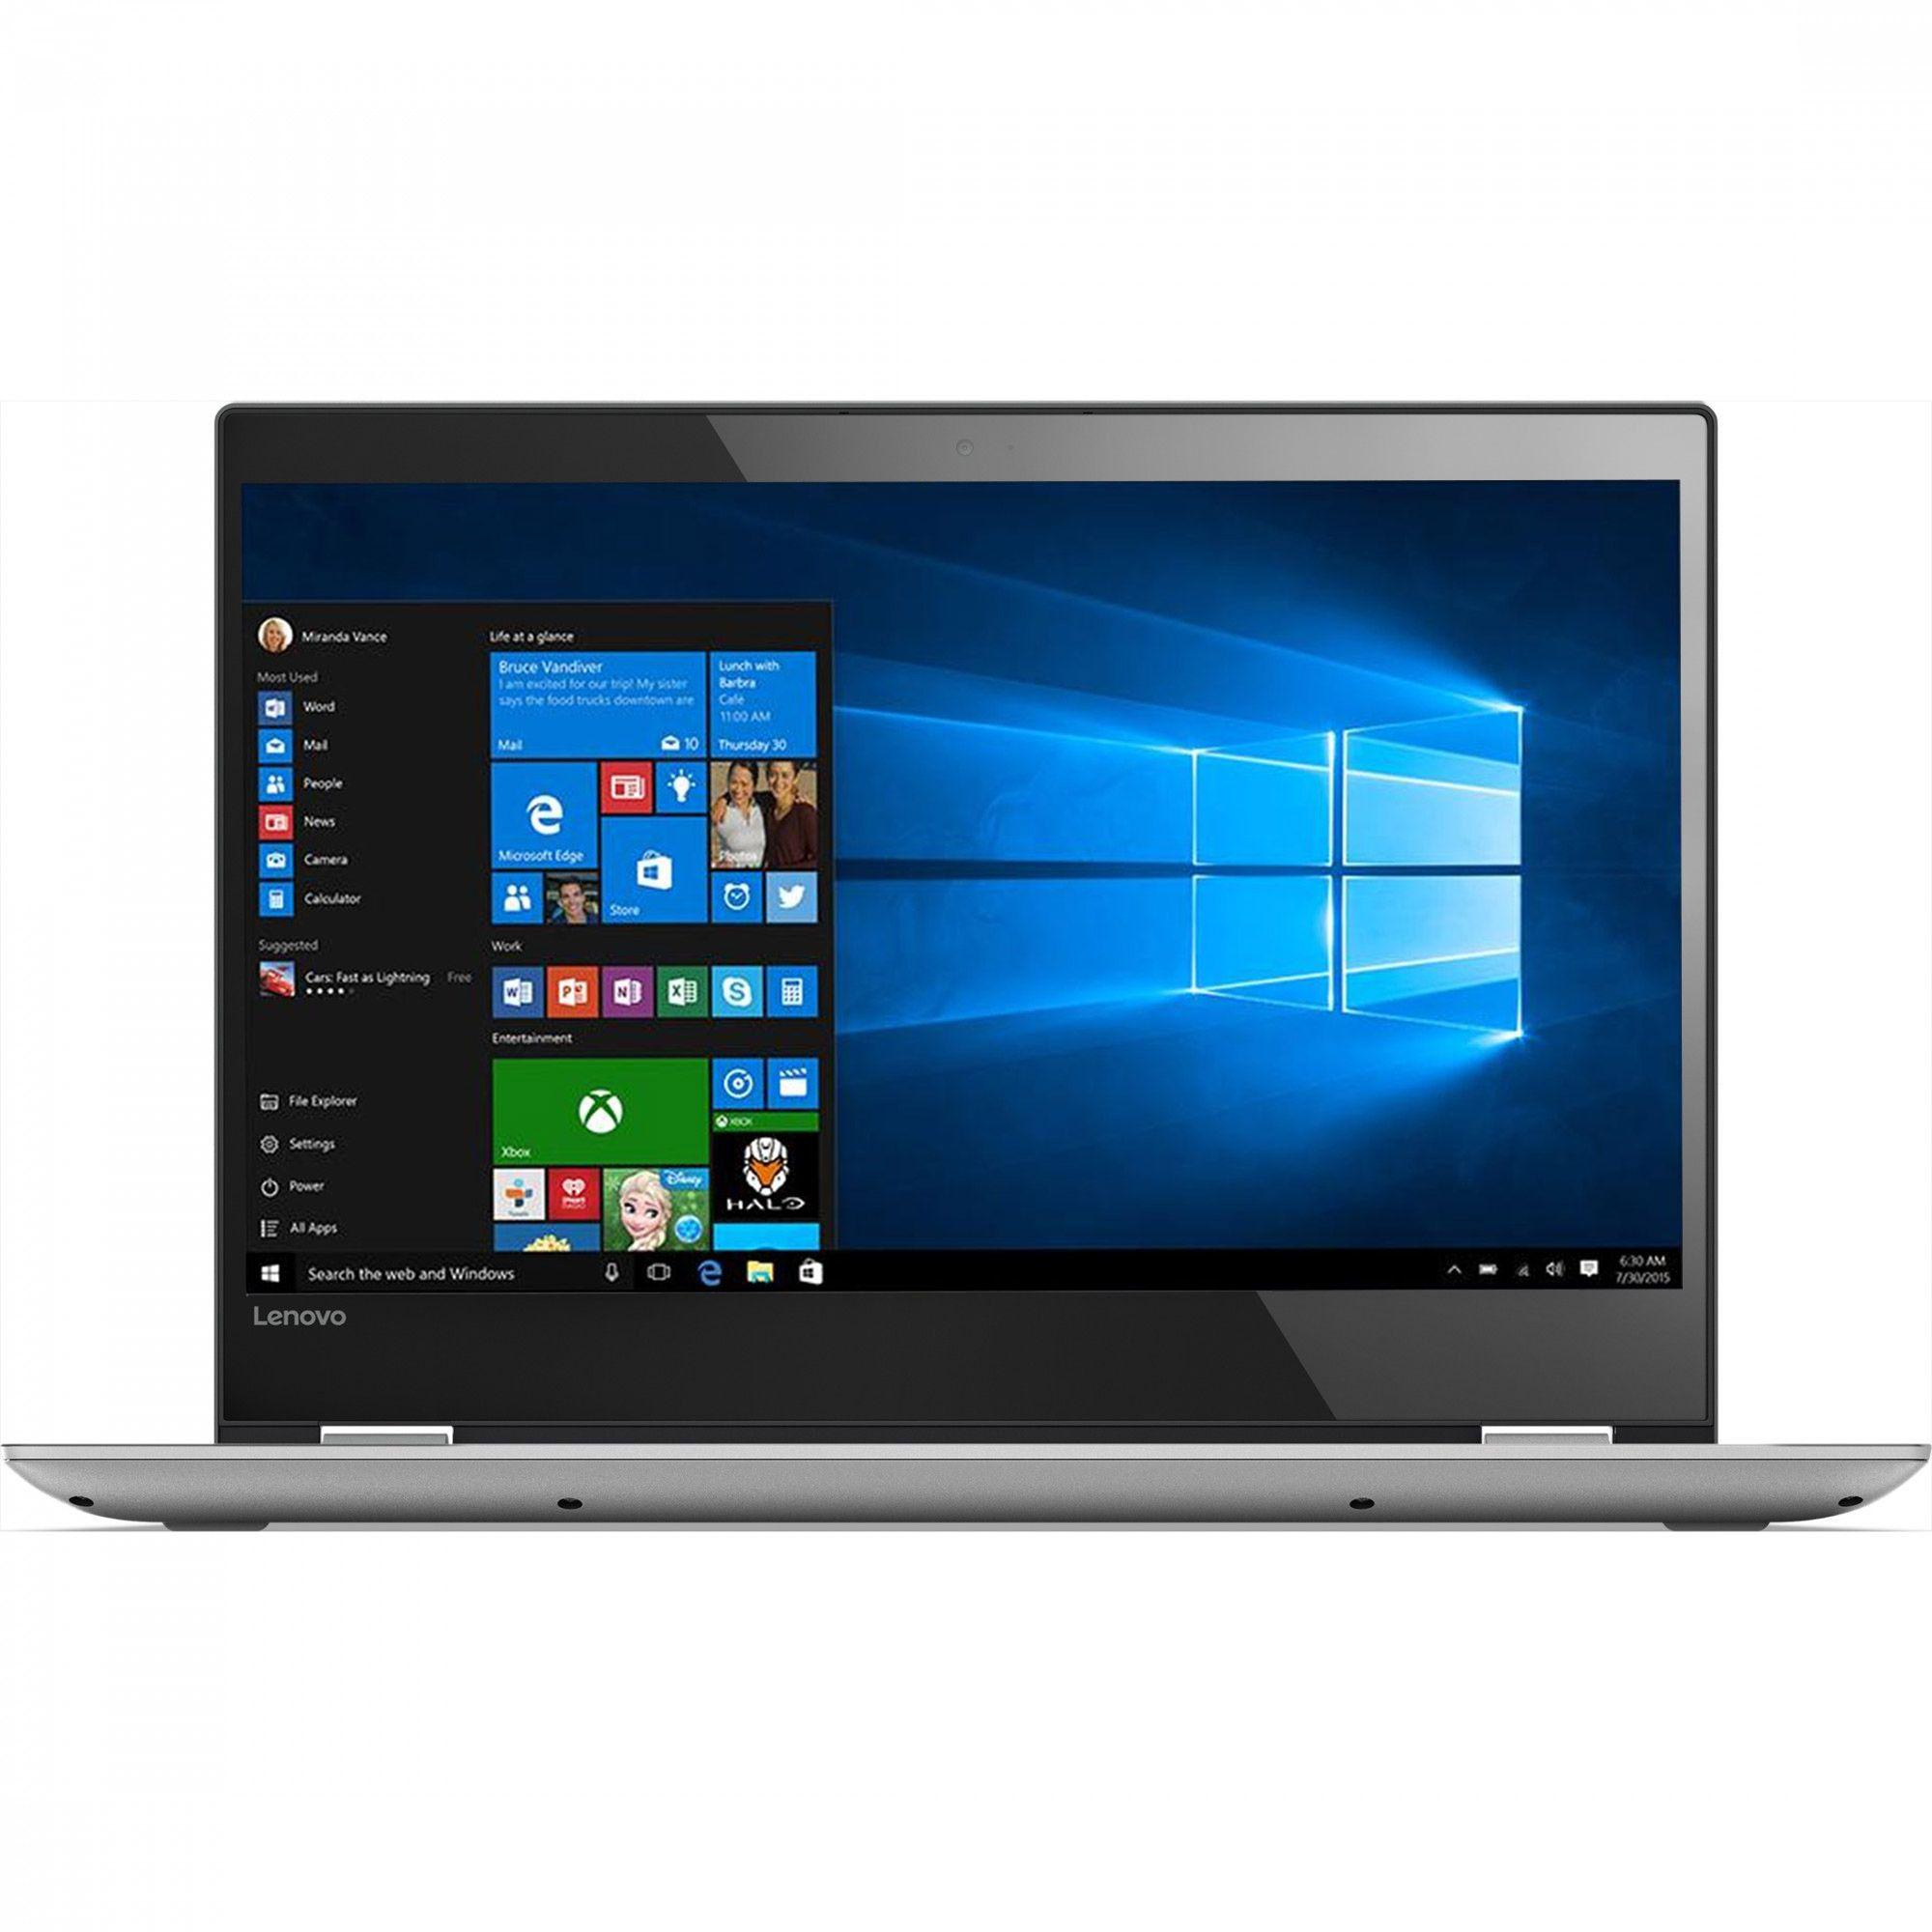 Ultrabook Lenovo Yoga 520 14 Full HD Touch Intel Core i5-8250U RAM 8GB HDD 1TB + SSD 128GB Windows 10 Home Gri